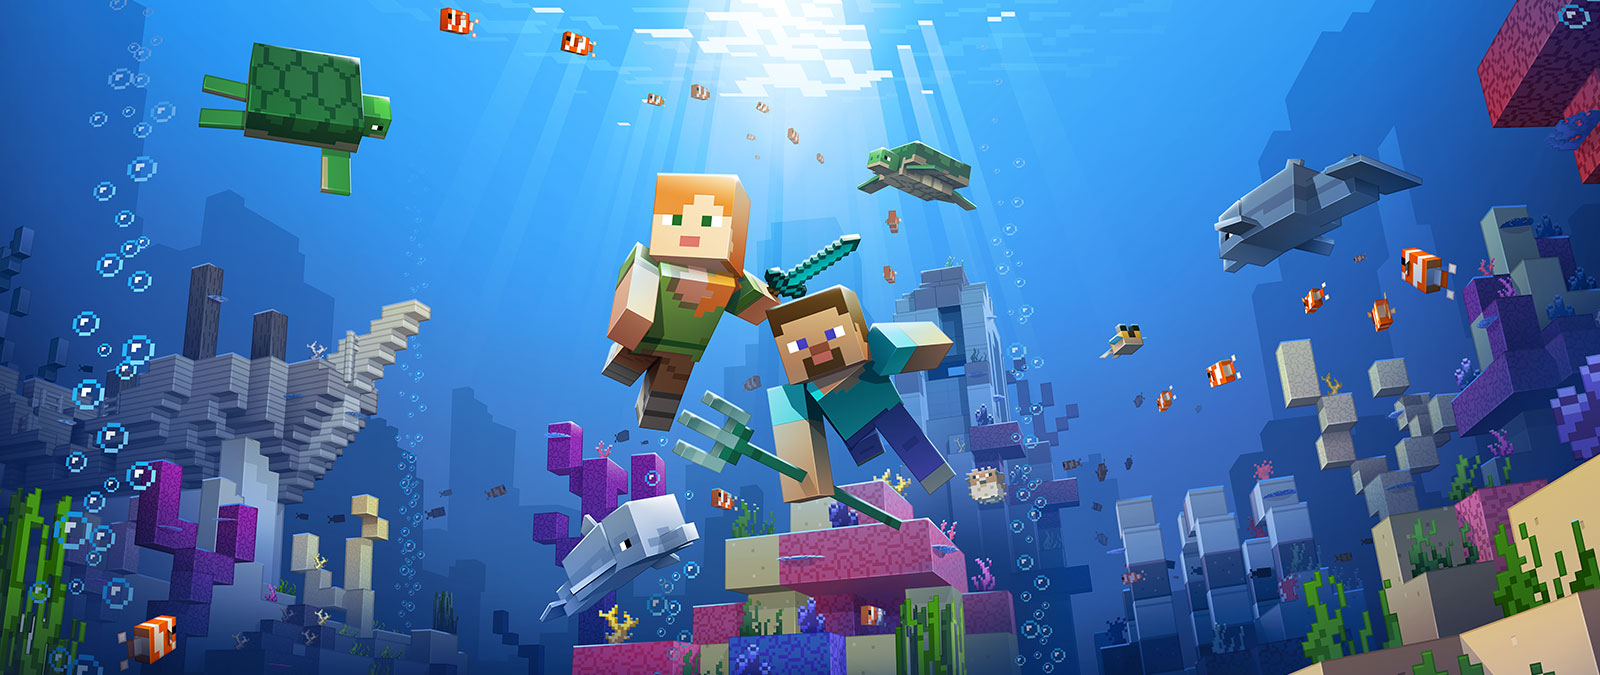 Top 20 Minecraft 1.16.4 Seeds (December 2020)